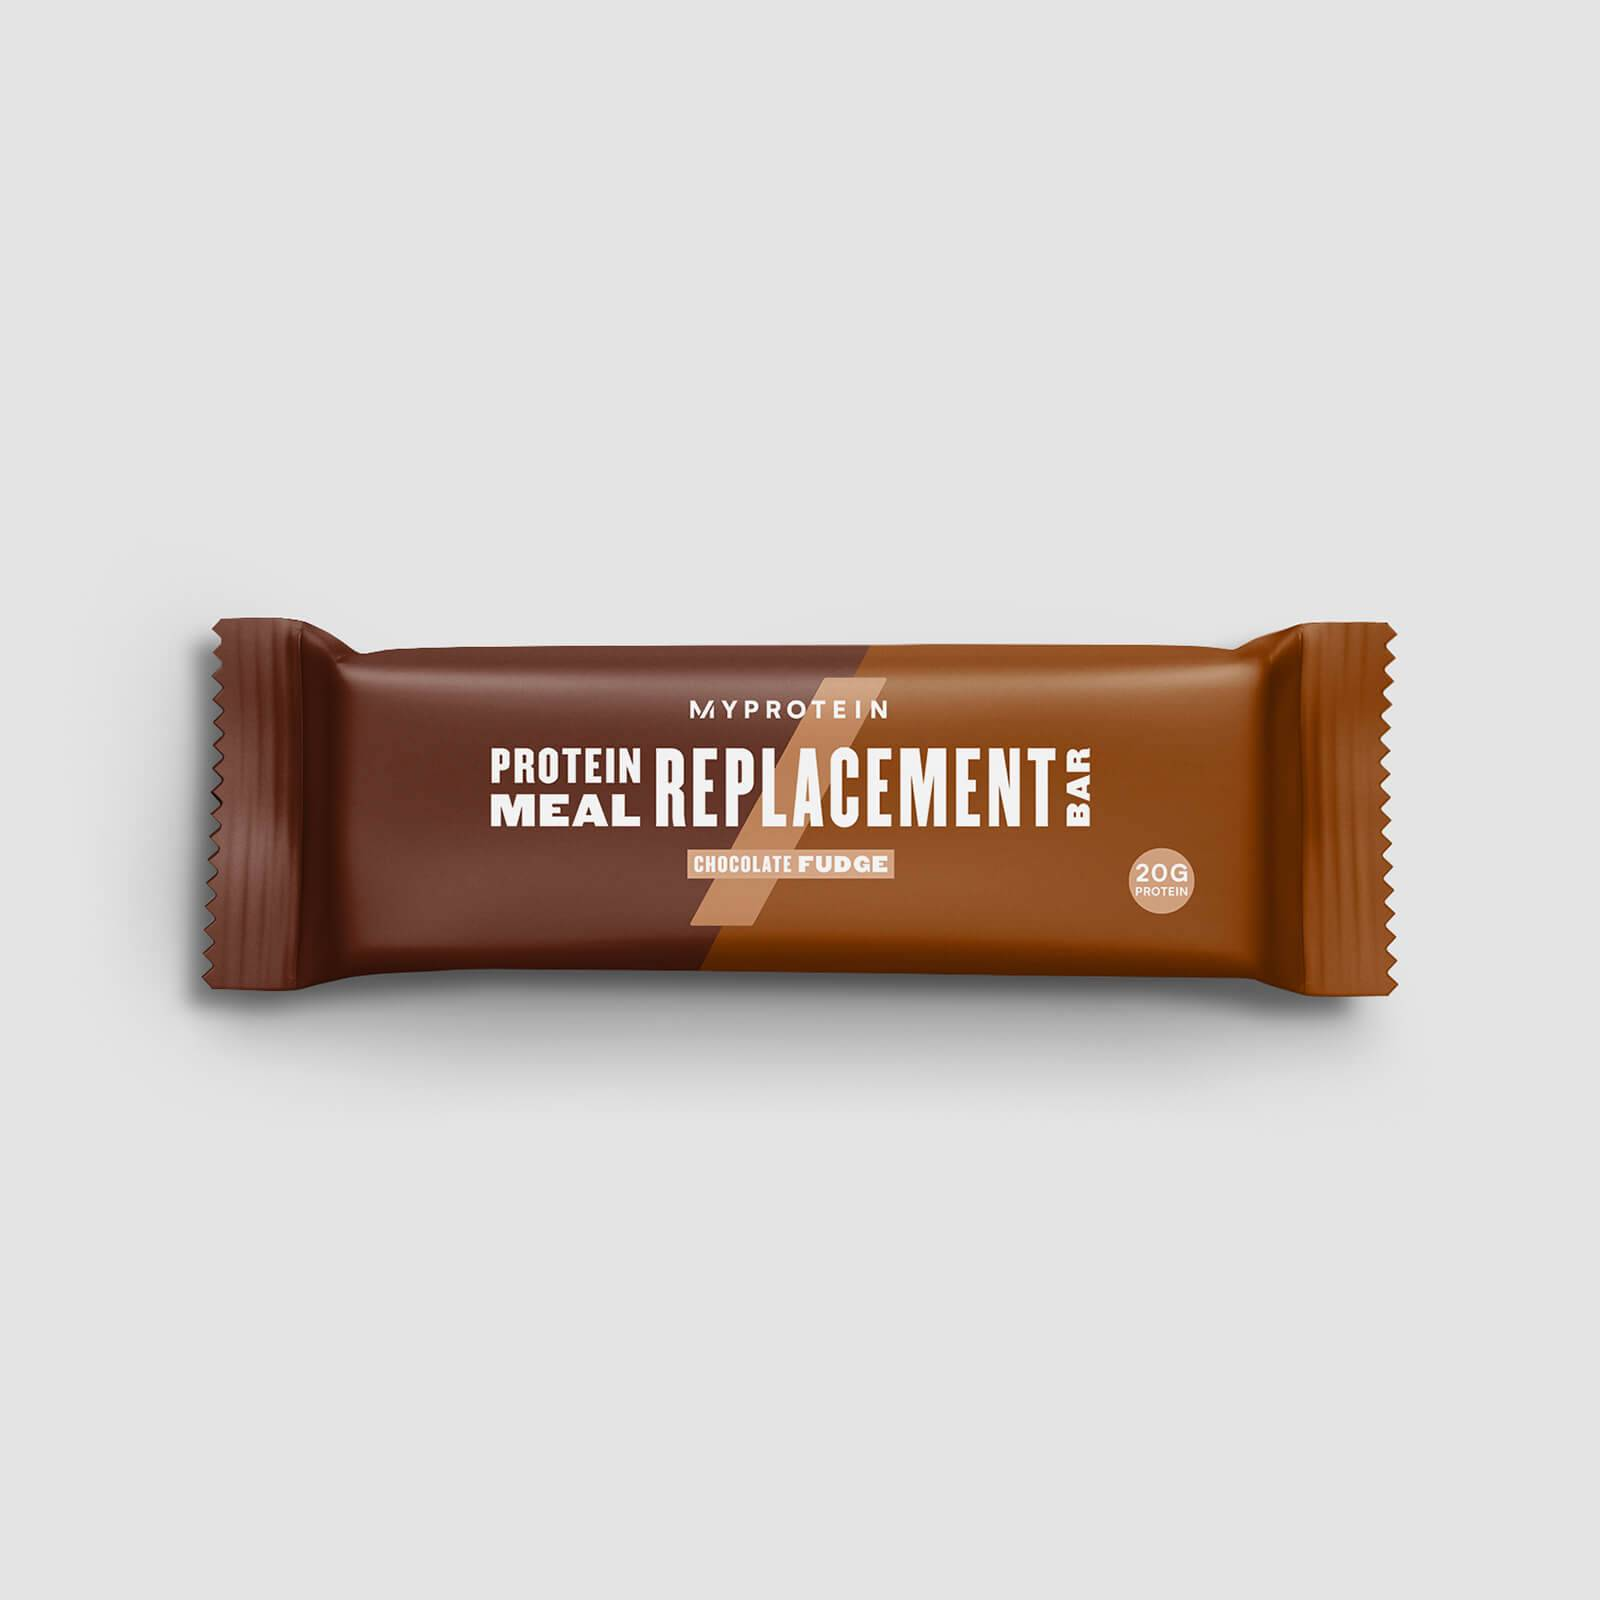 Myprotein Protein ateriankorvikepatukka - 12 x 65g - Chocolate Fudge